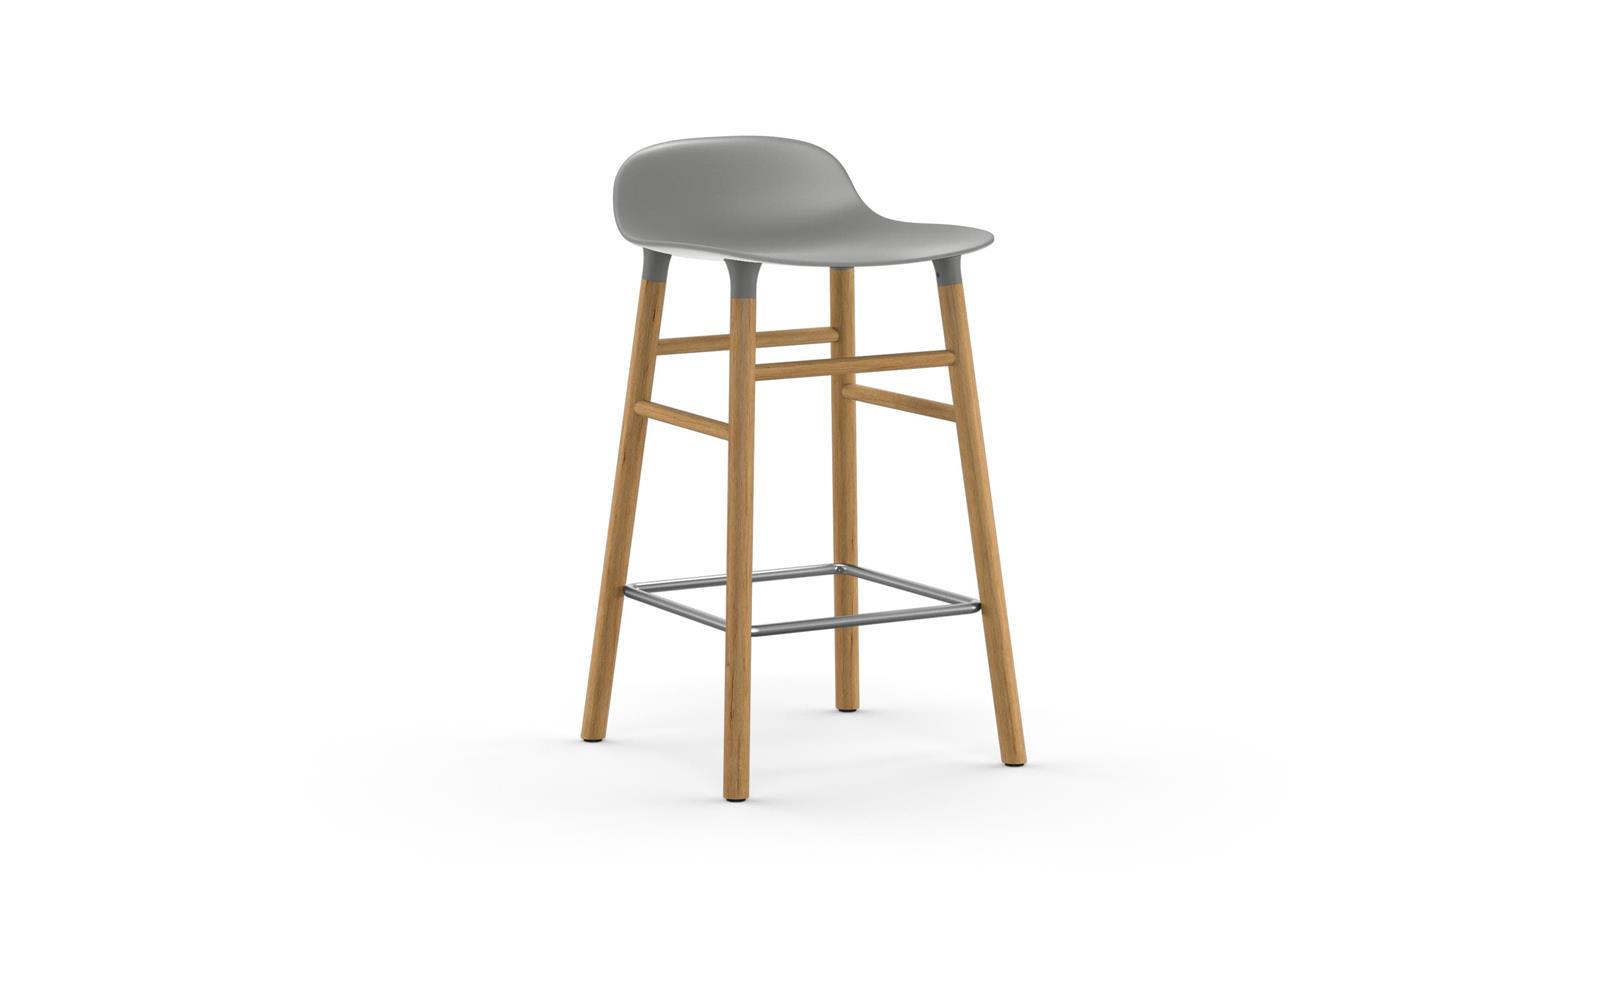 normann copenhagen form barstol